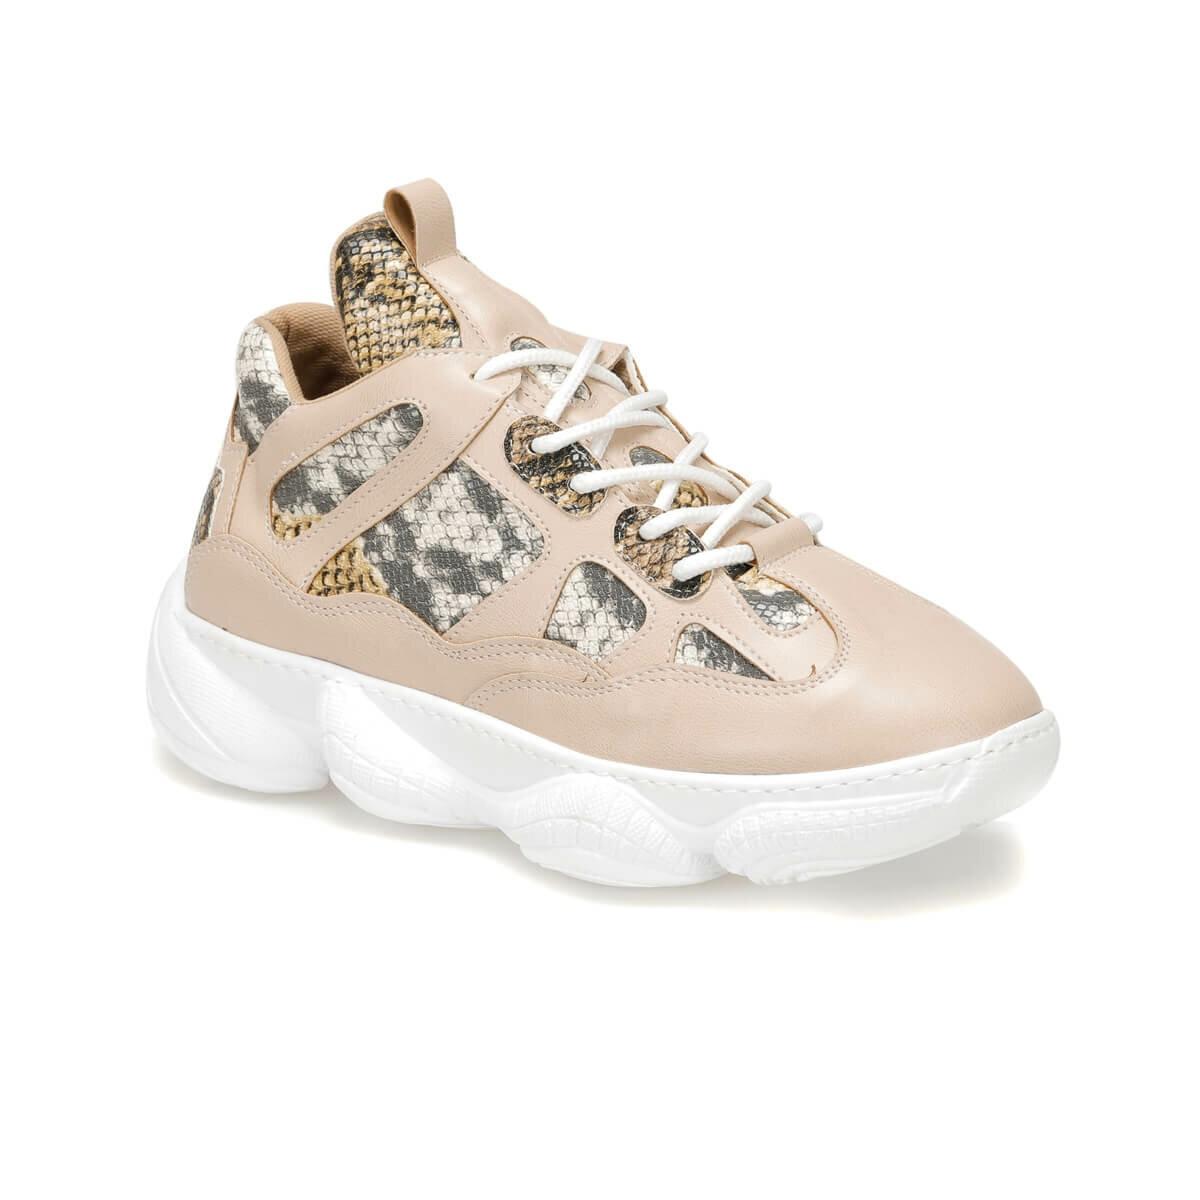 FLO 19SF-1504 Beige Women 'S Sneaker BUTIGO